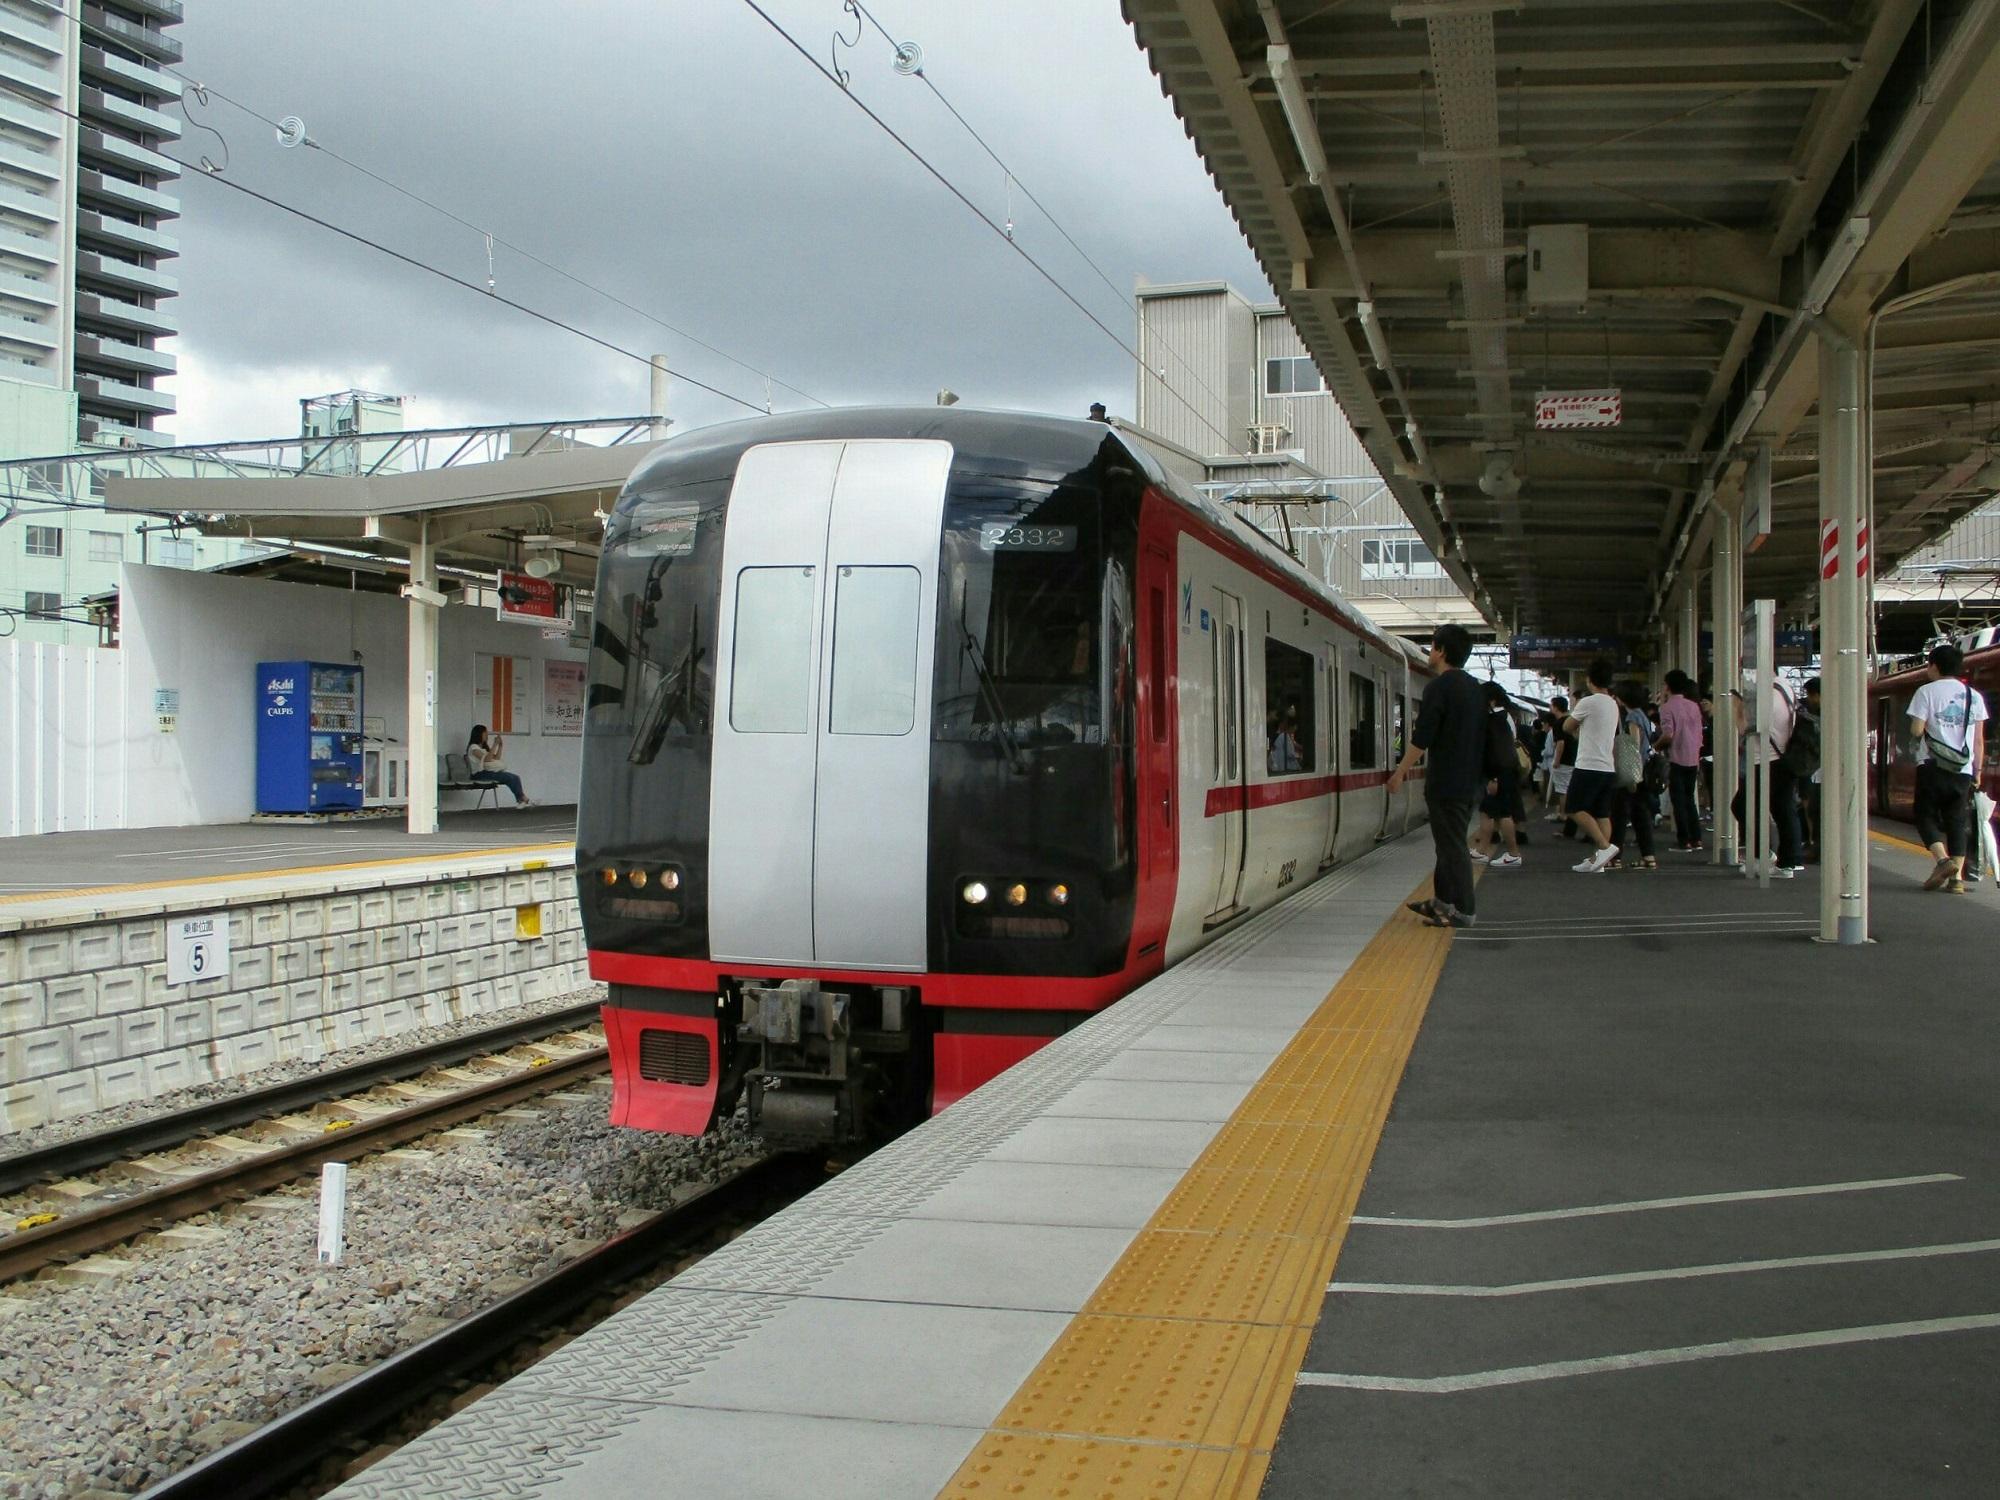 2018.6.30 (4) 知立 - 新鵜沼いき快速特急 2000-1500